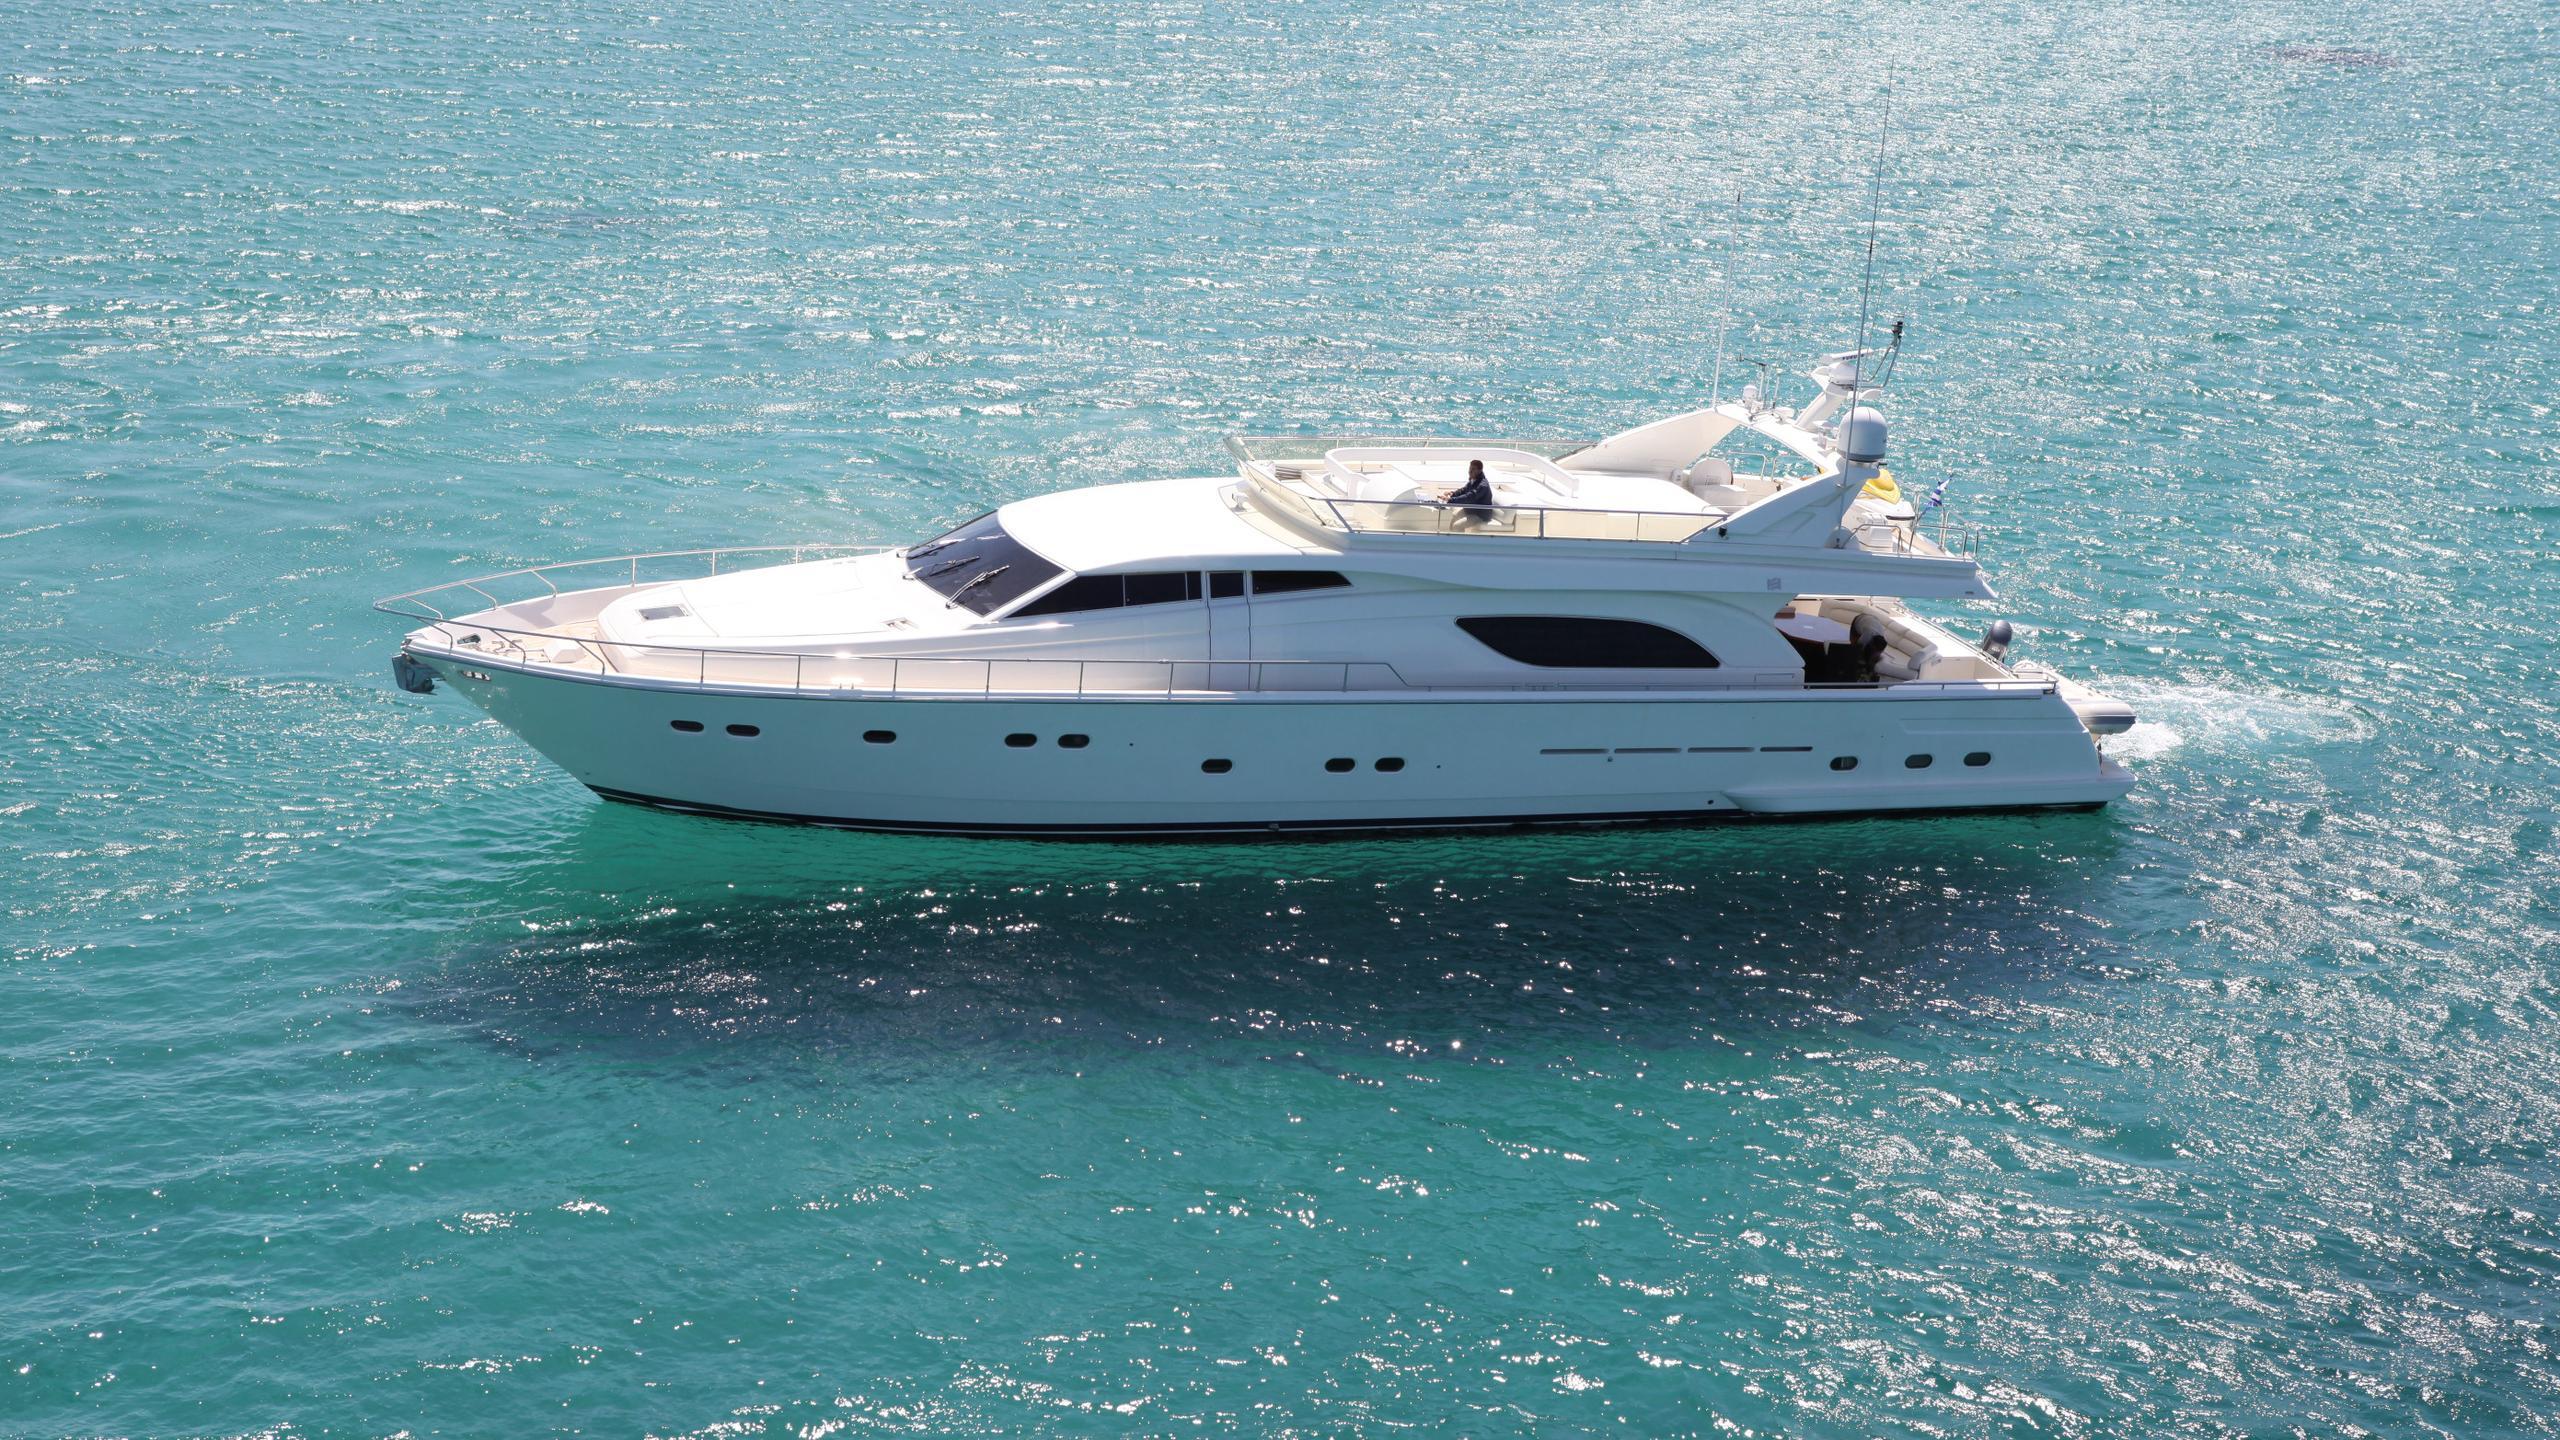 kentavros-ii-yacht-for-charter-profile